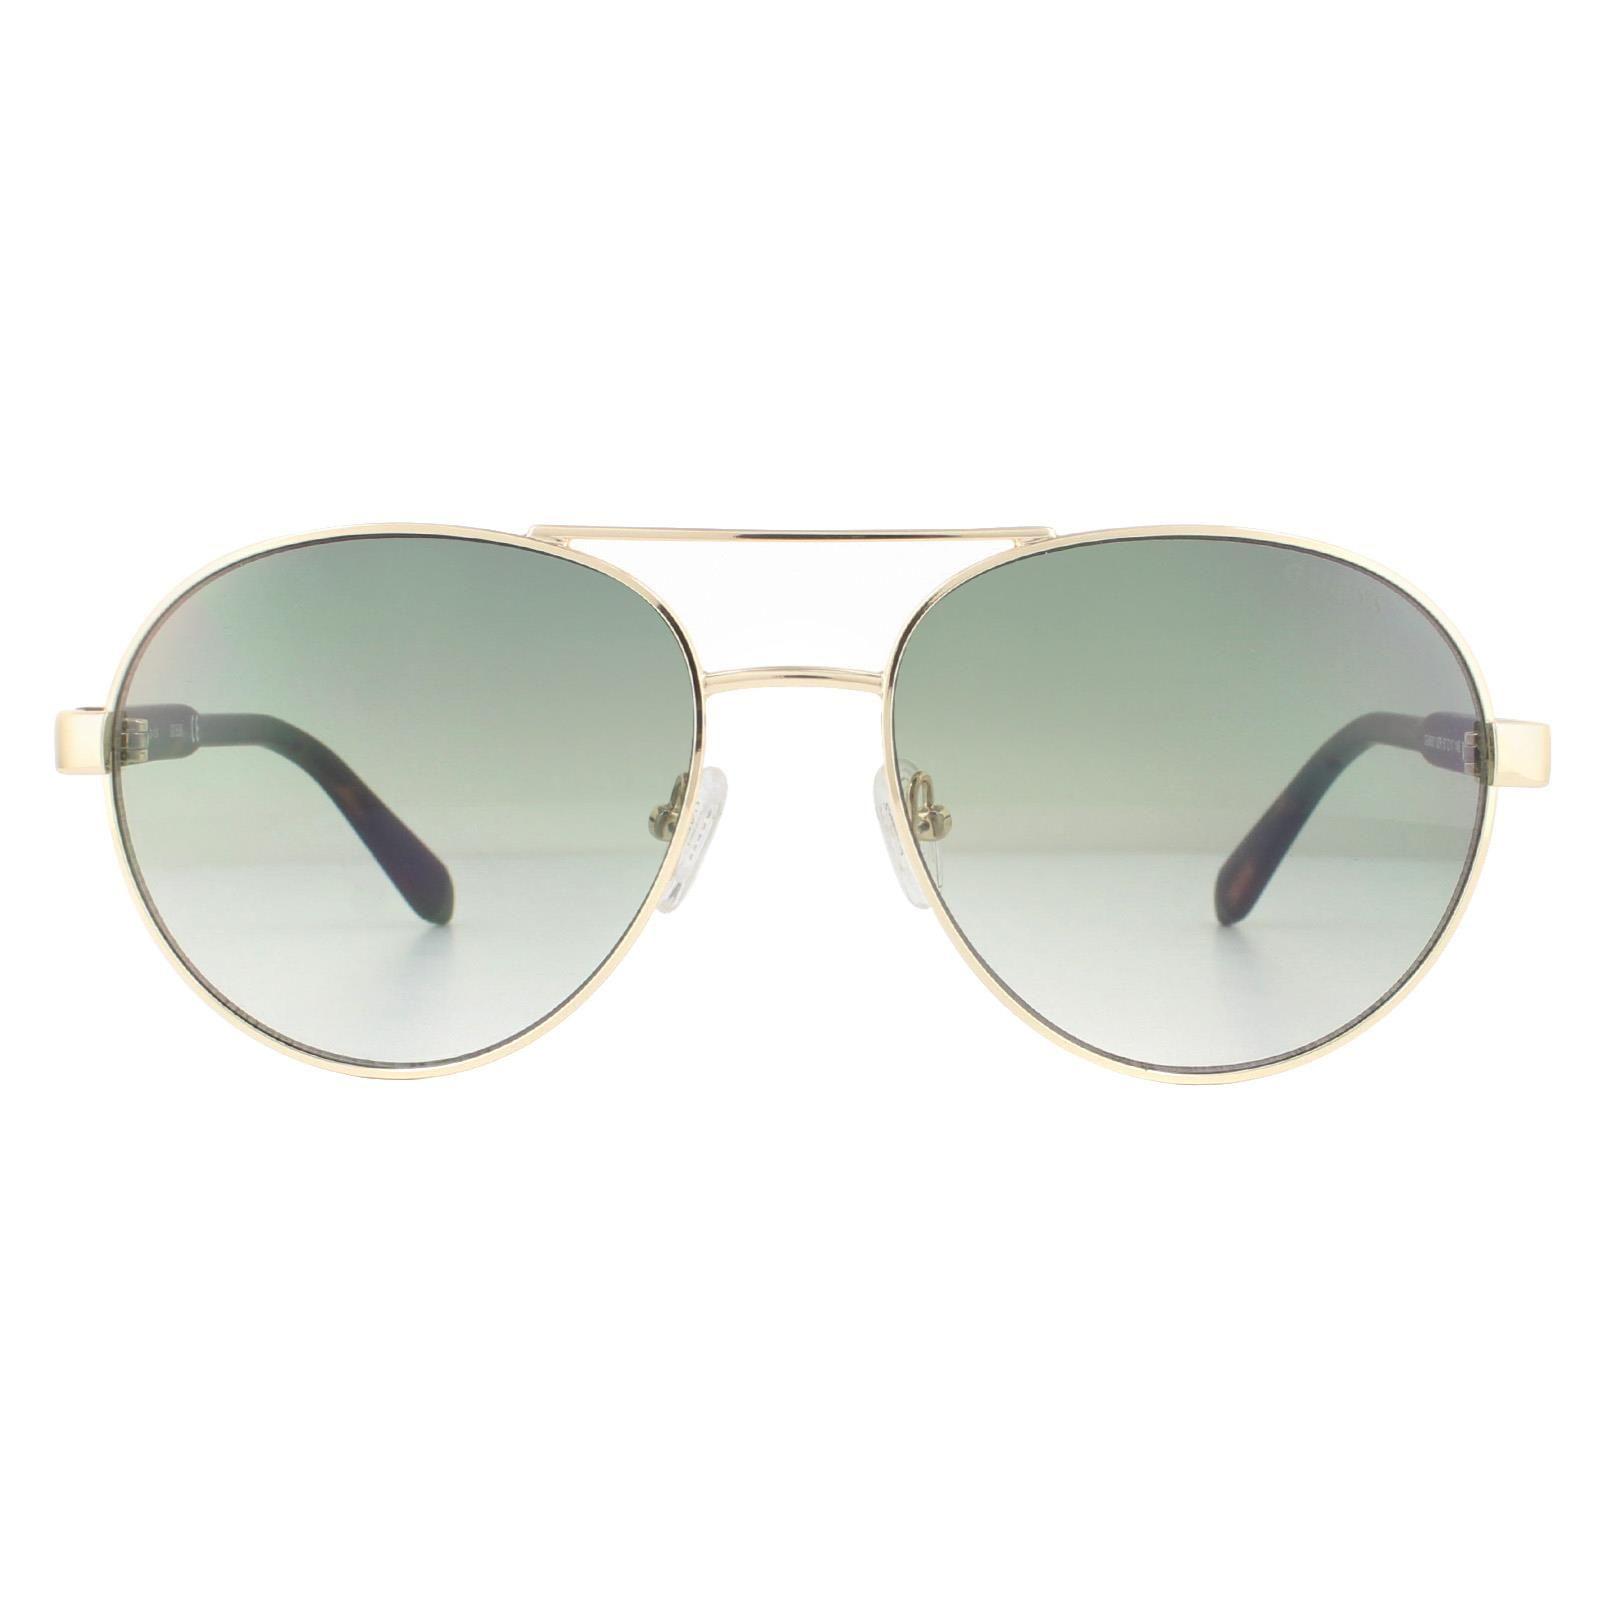 Guess Sunglasses GU6951 32P Gold Green Gradient